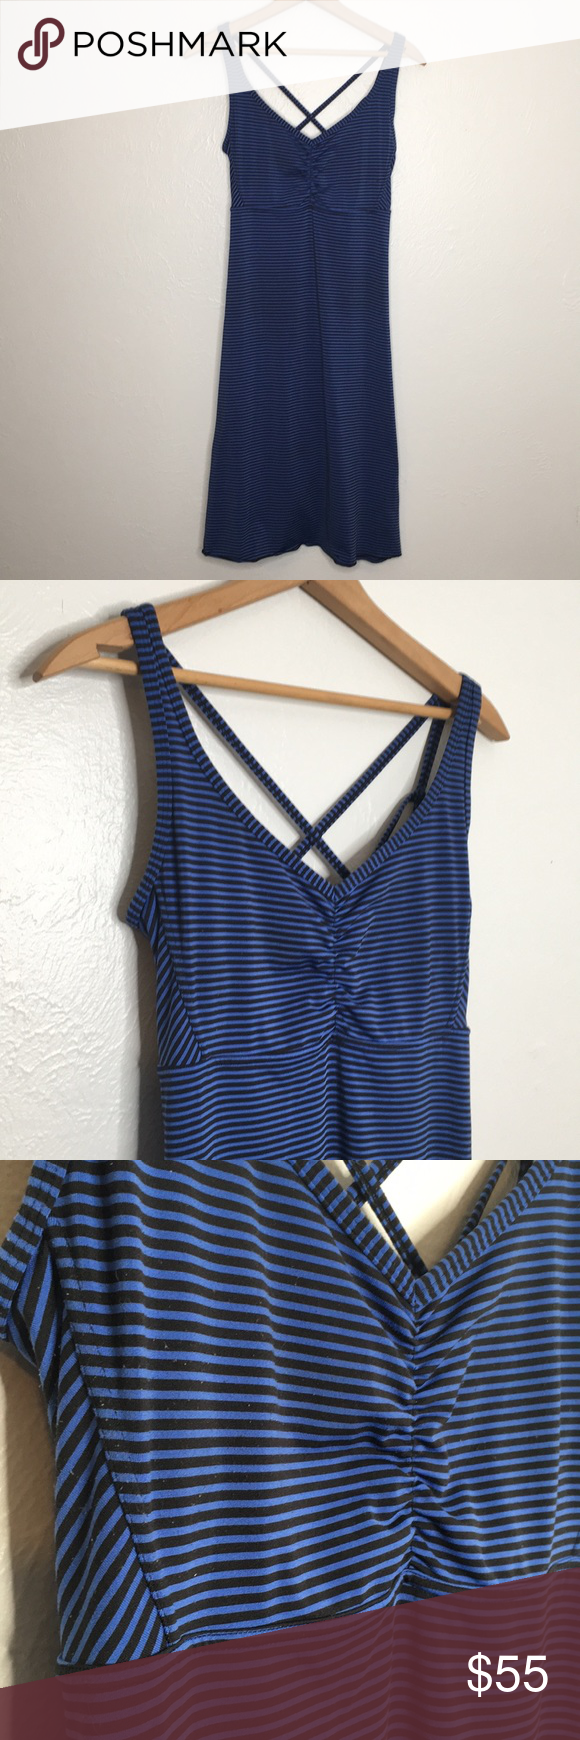 Prana Blue Black Stripe Dress With Built In Bra M Black Striped Dress Striped Dress Active Wear Dresses [ 1740 x 580 Pixel ]